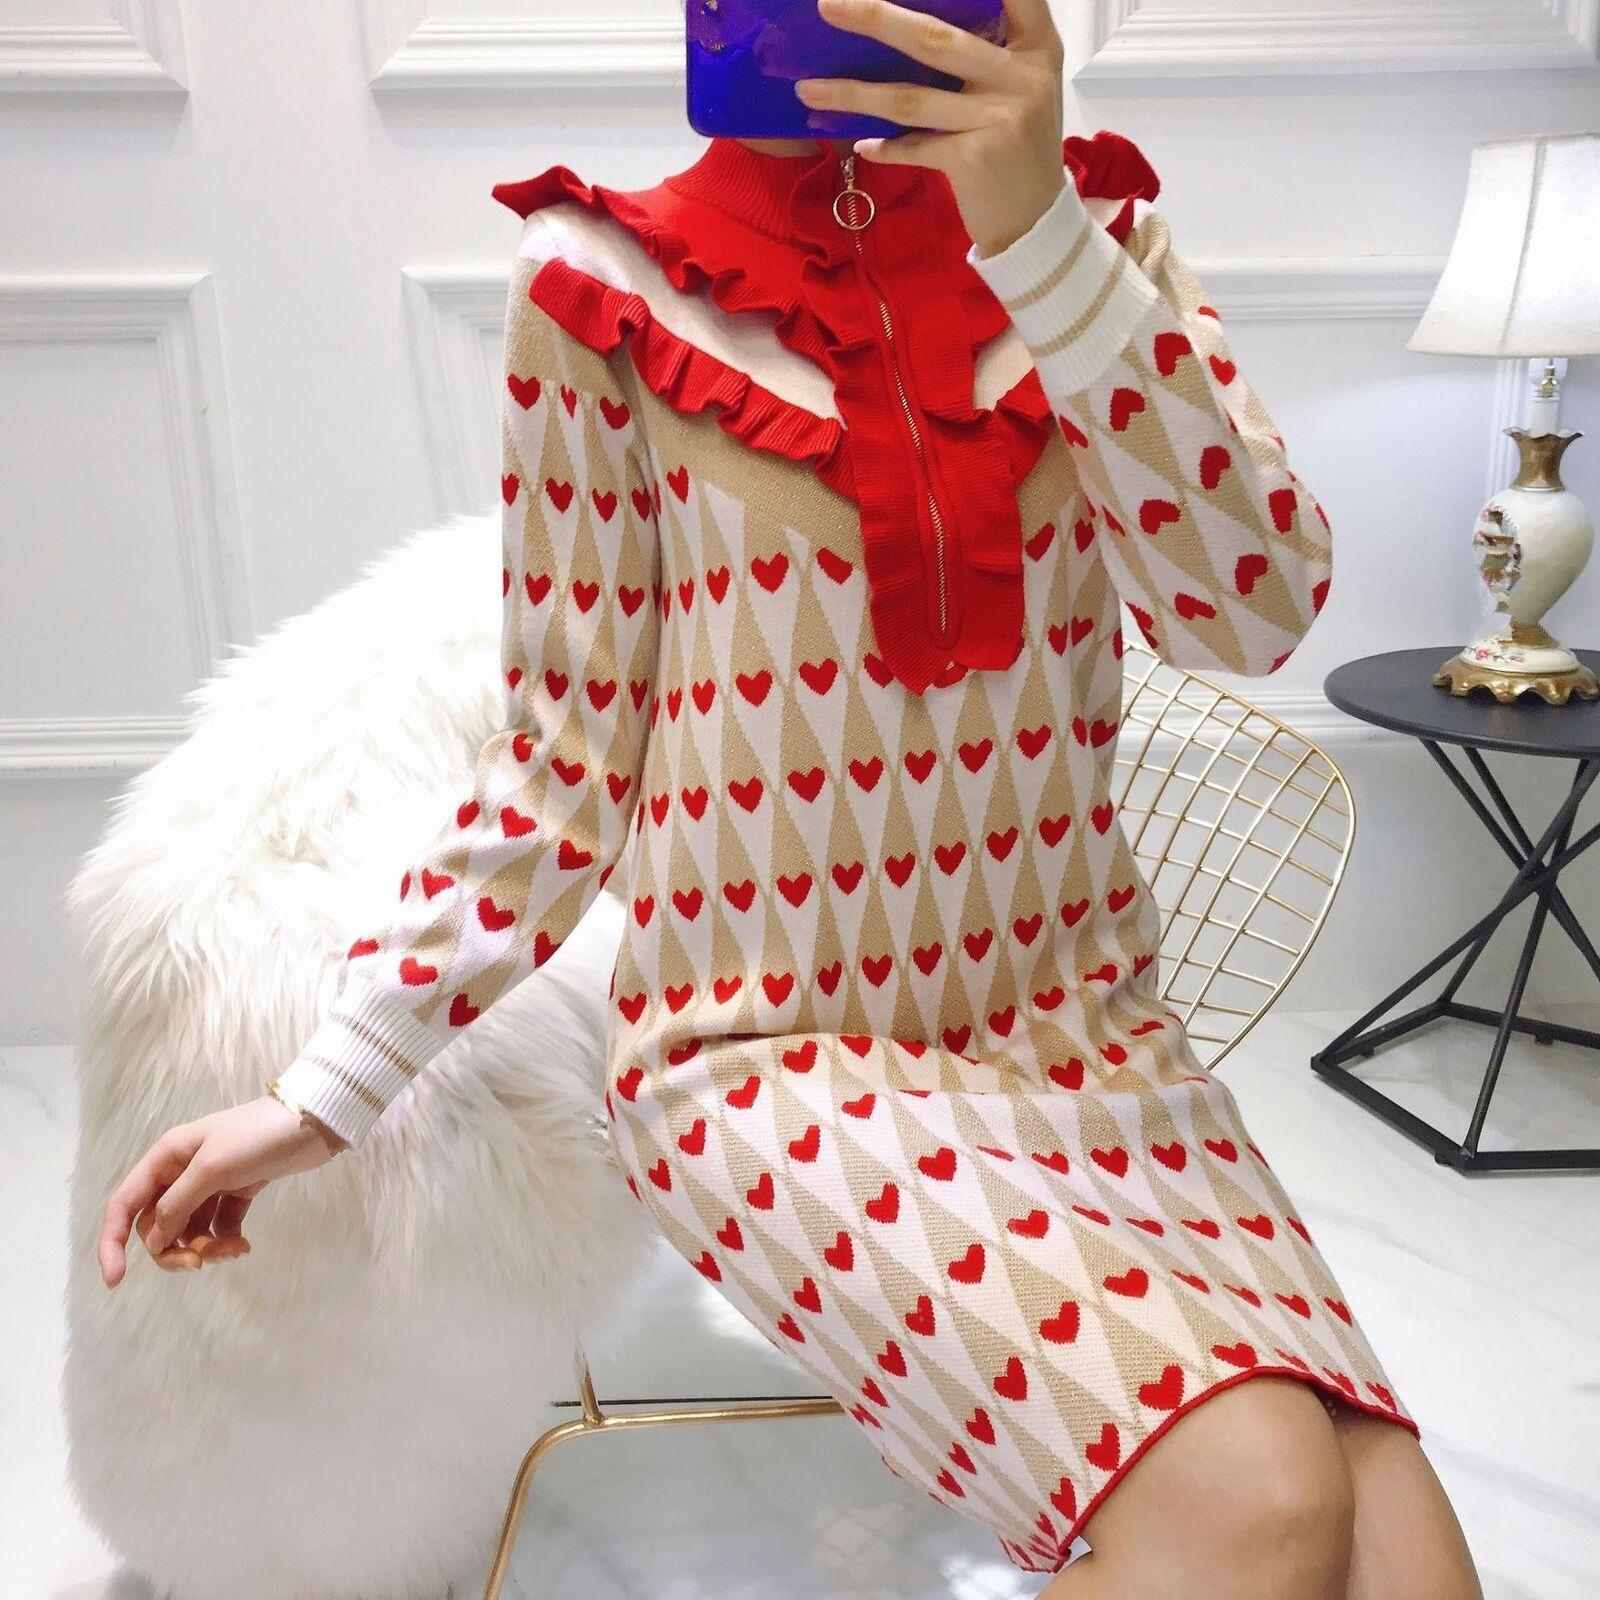 Multi Farbe Zipper Half High Collar Ruffles Sweater Kleid Heart Glitter Knit